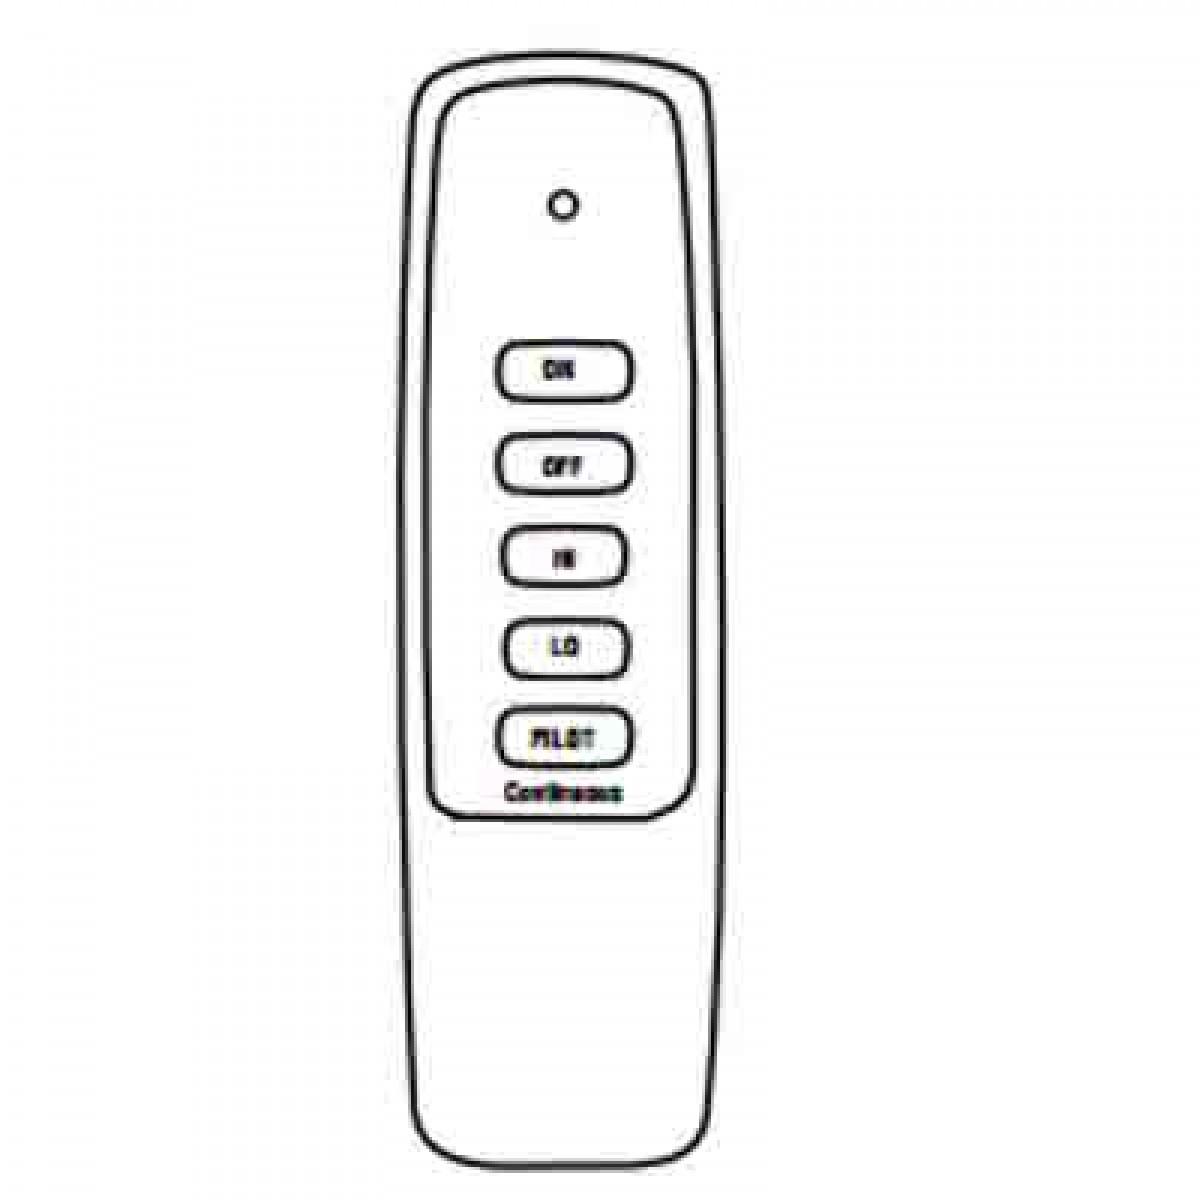 IHP Superior EF-BRCK EcoFlow Basic Remote Control On/Off